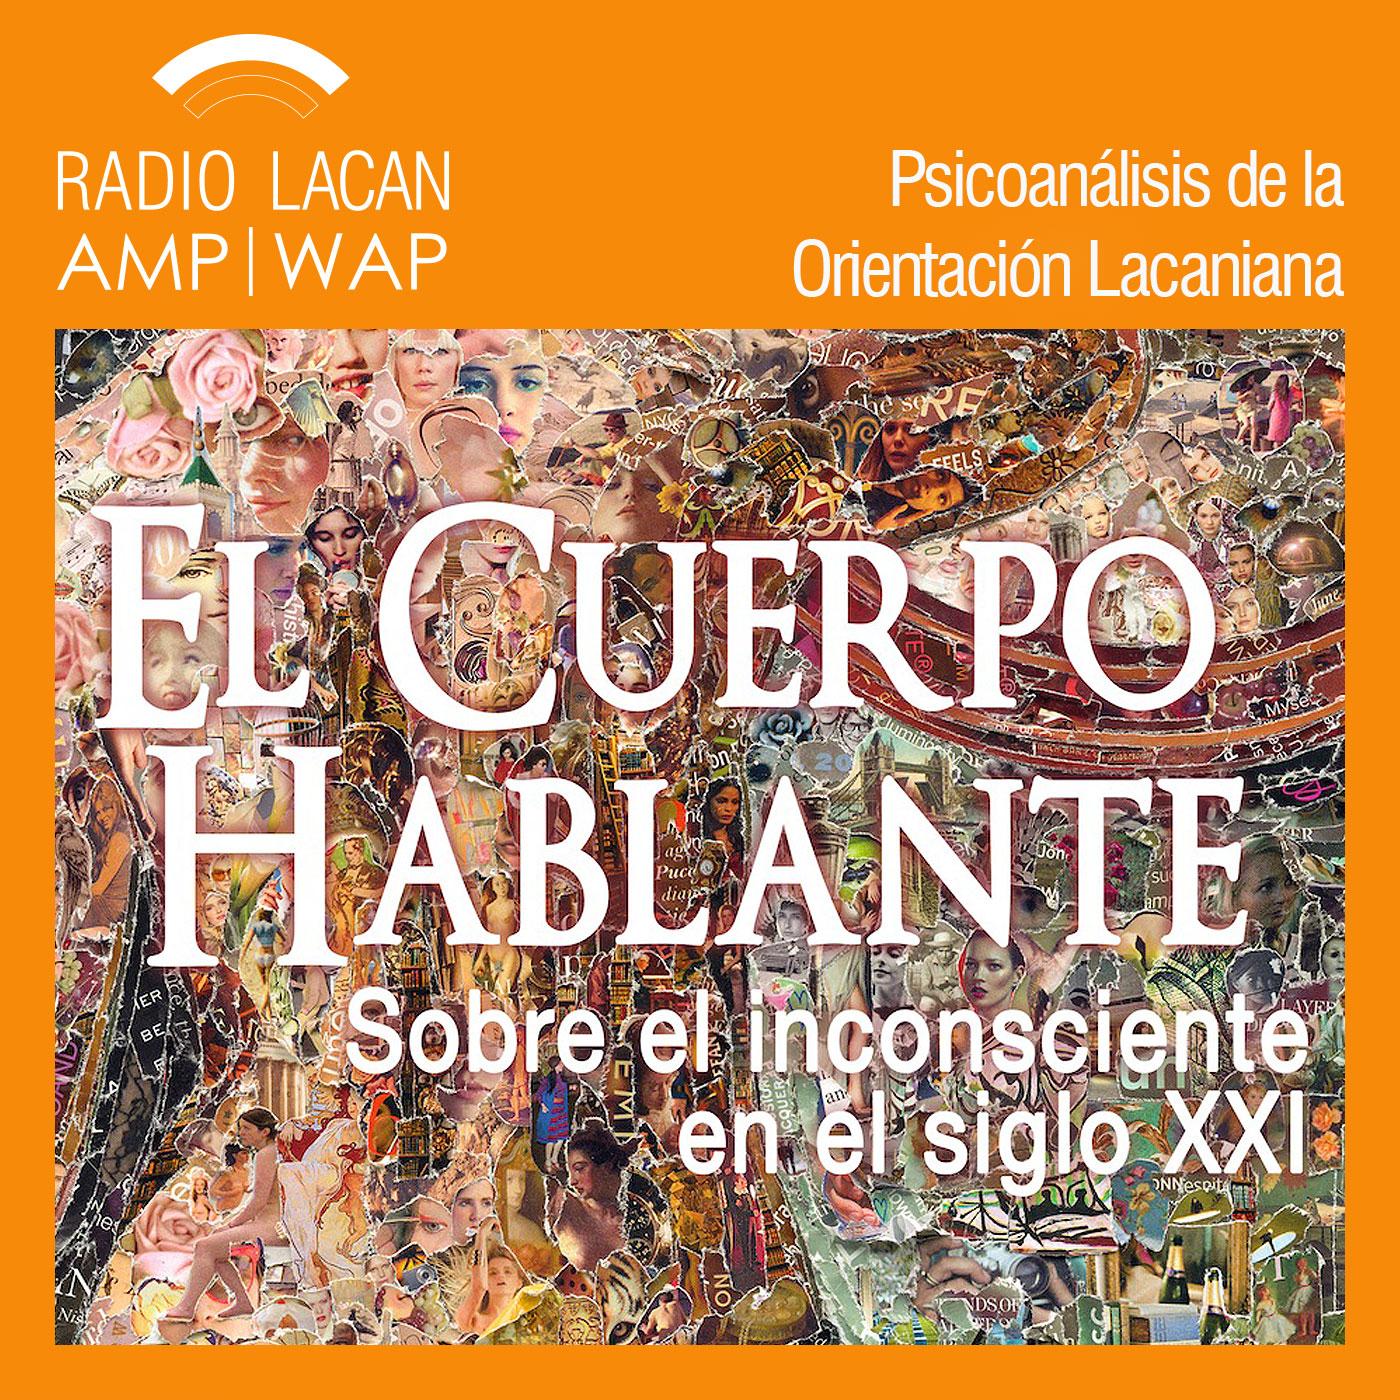 RadioLacan.com | <![CDATA[Hacia el Congreso AMP-RIO 2016: Entrevista a Marcus André Vieira]]>